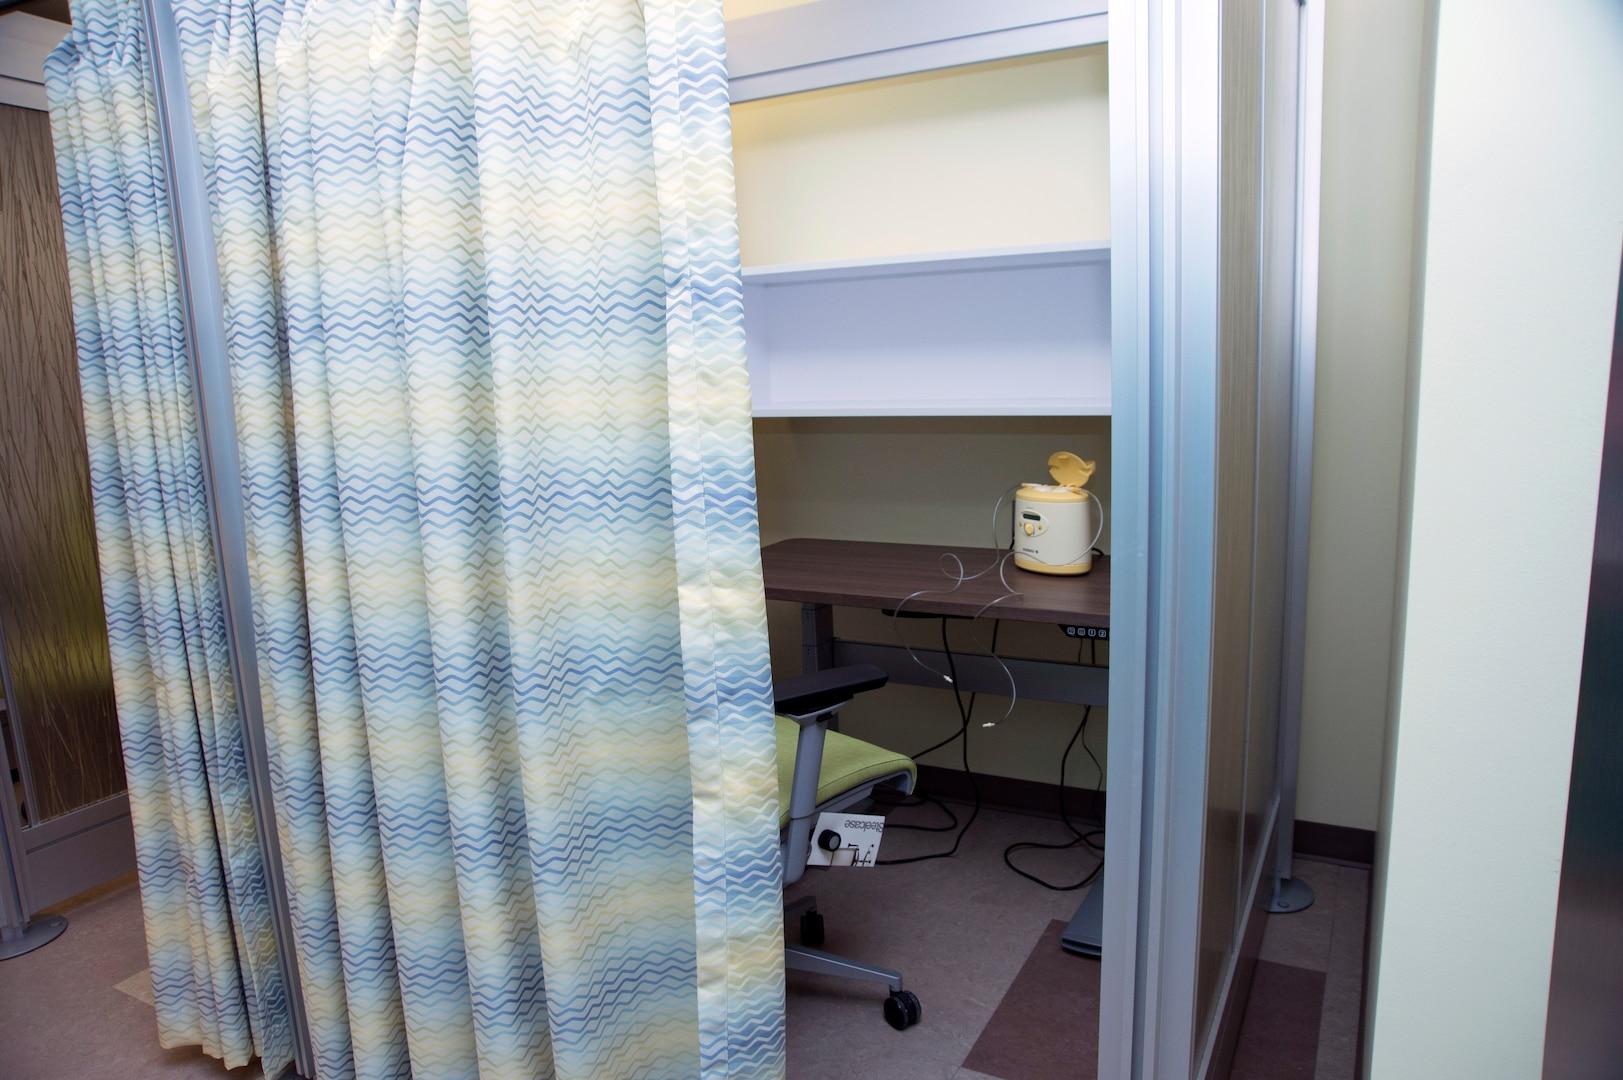 NSA provides hospital grade breast pumps for nursing mothers